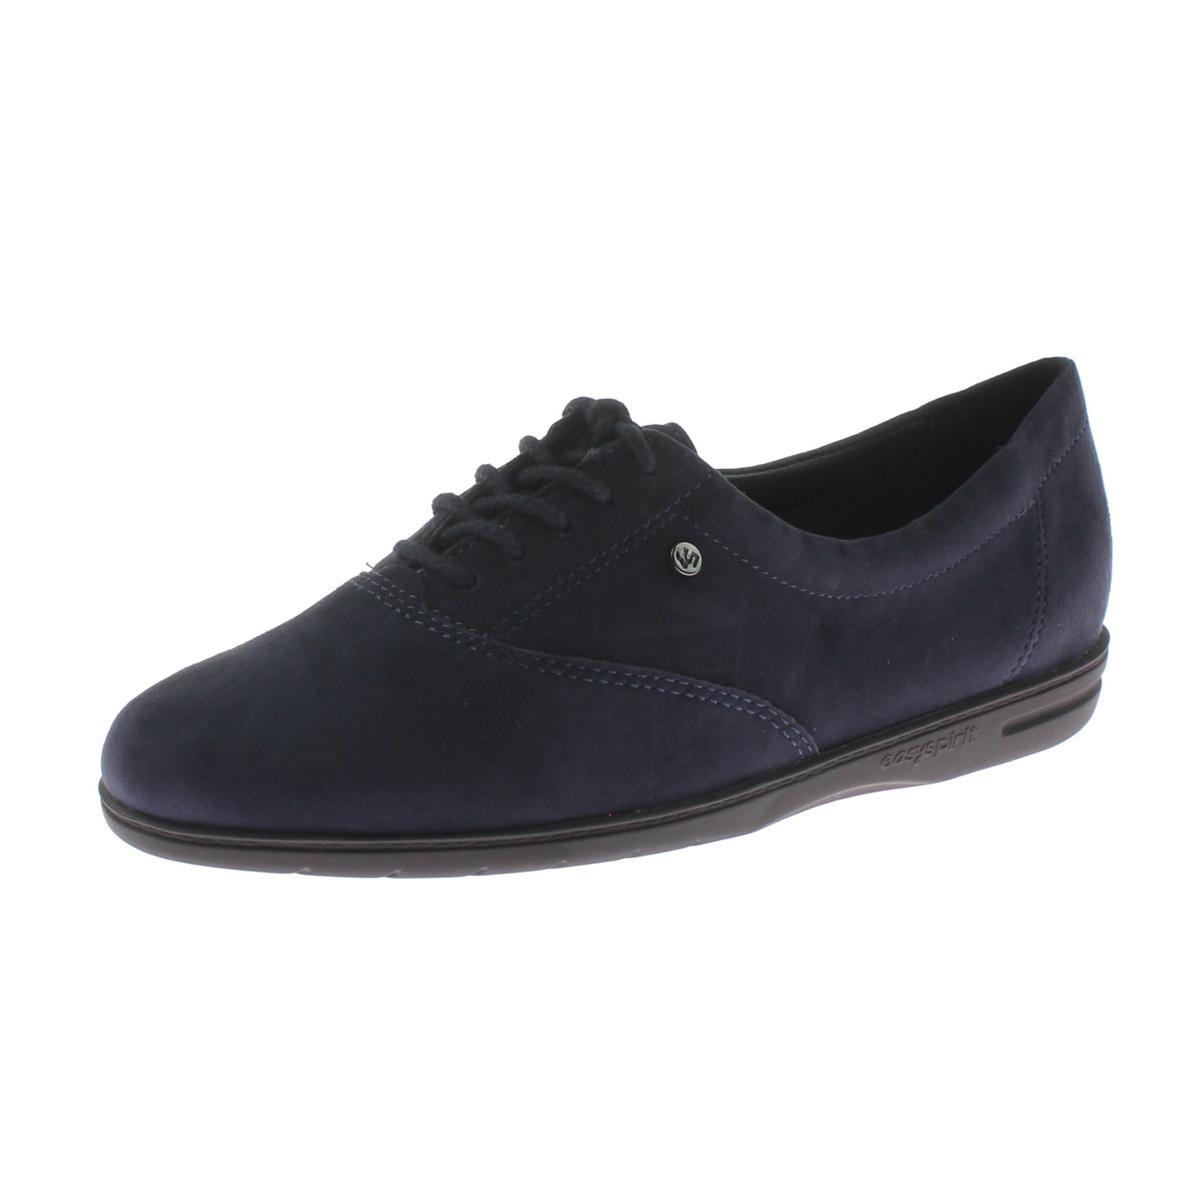 Easy Spirit Womens Motion Navy Suede Casual Shoes 4.5 Medium (BM) BHFO 6957